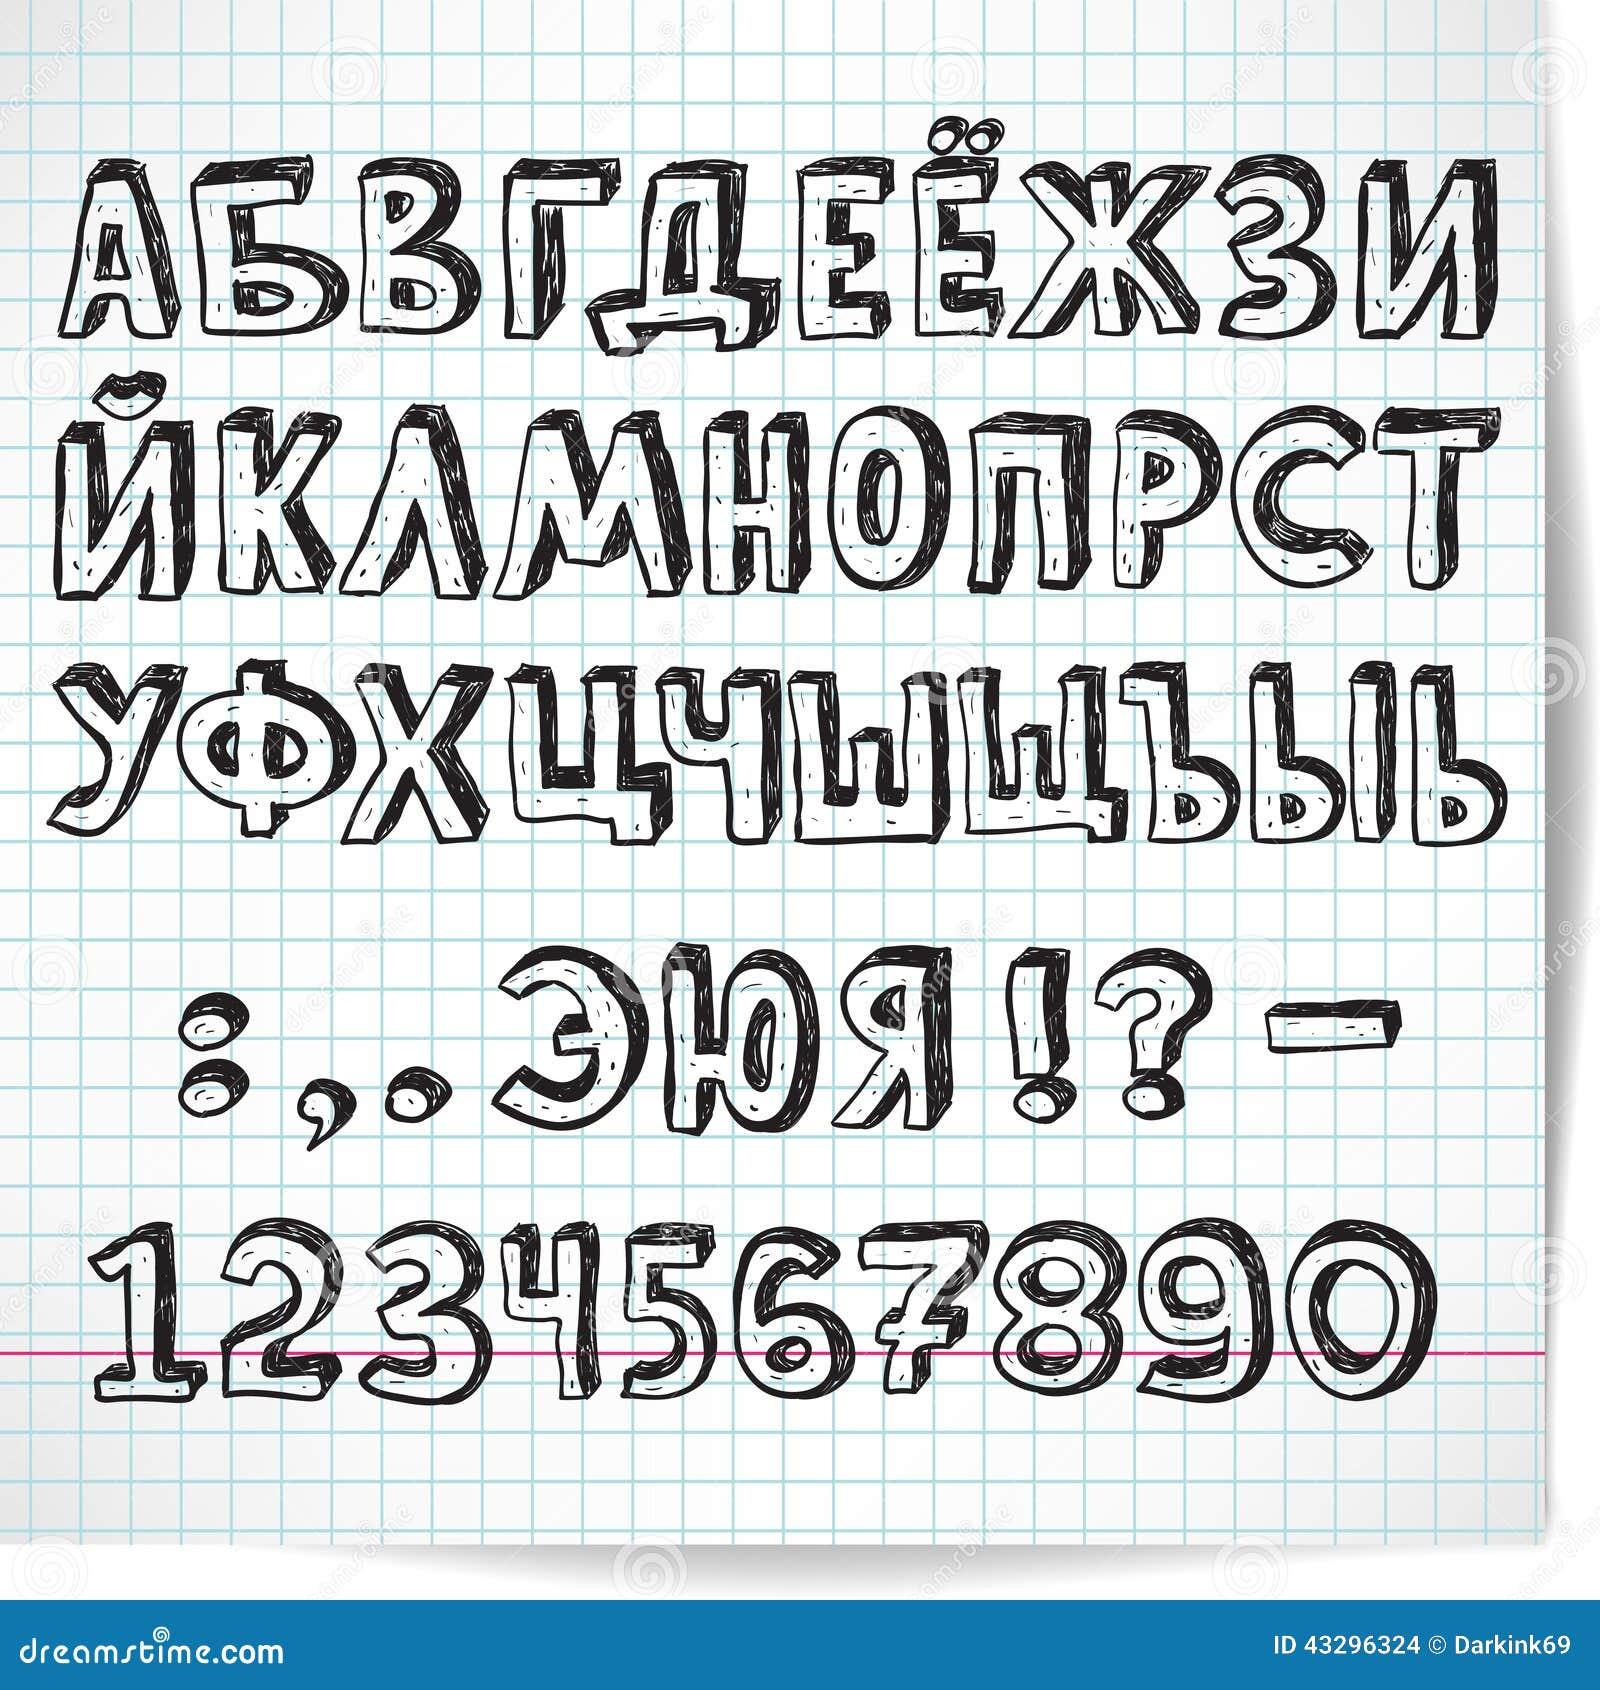 Cyrillic Alphabet Decorative Font On A Background Of Checkered Stock Illustration - Image 43296324